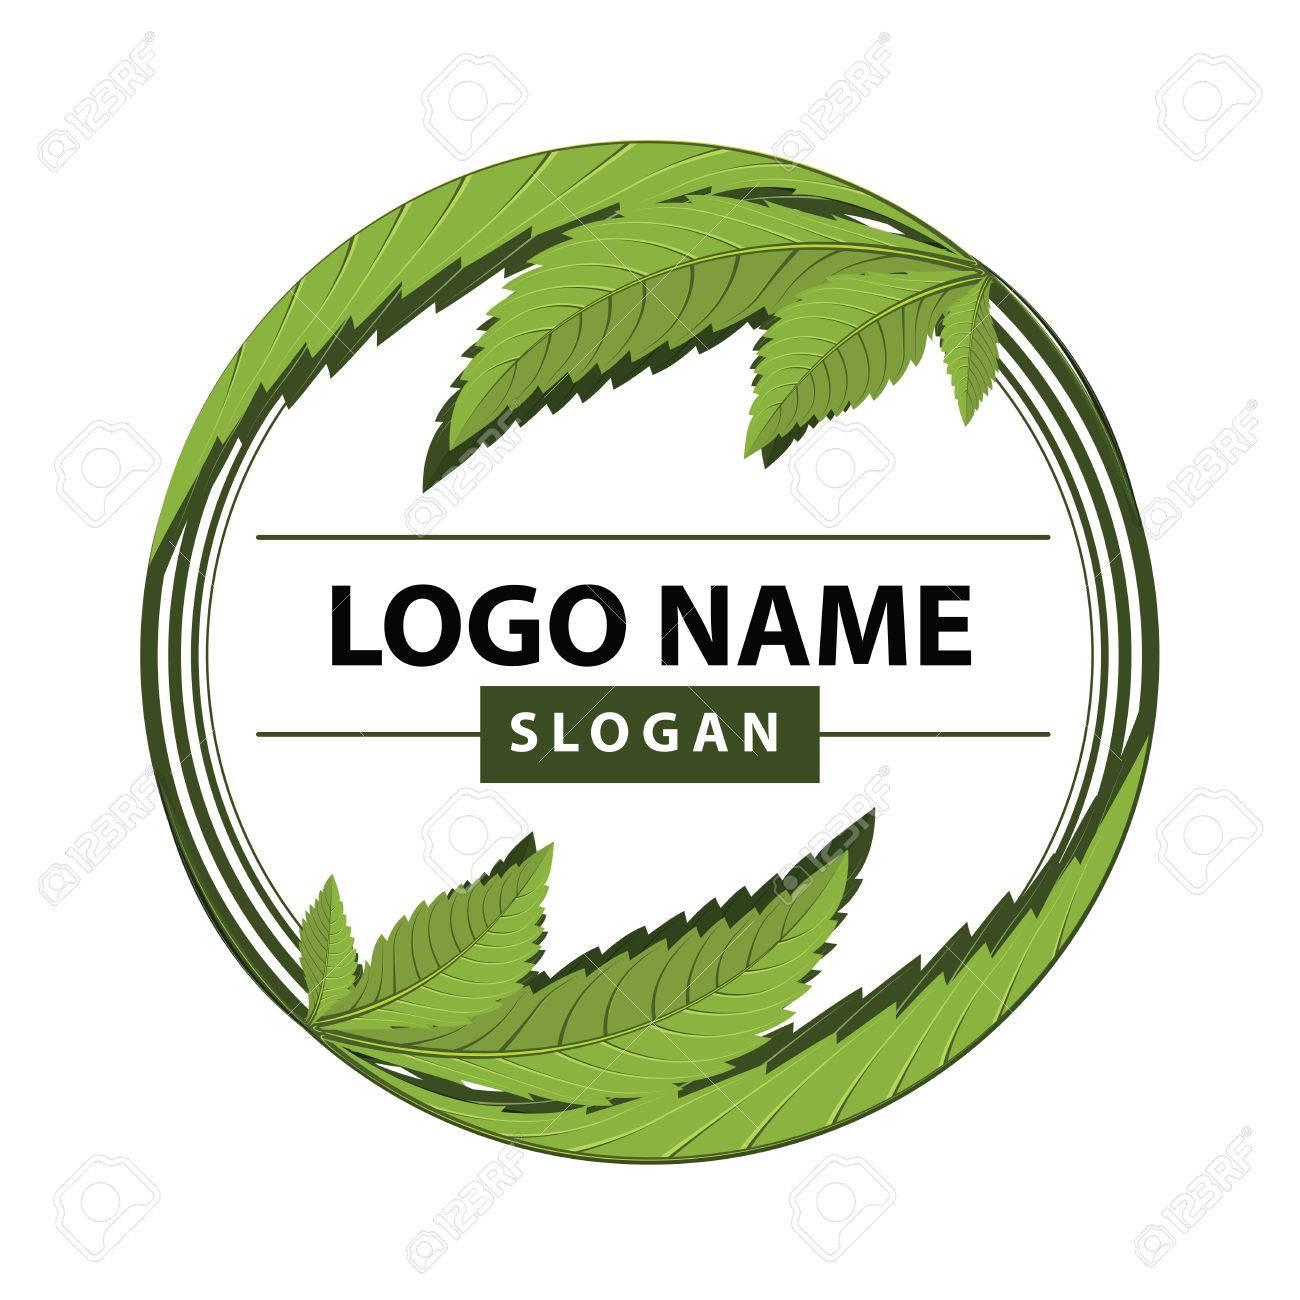 medical marijuana, cannabis green leaf logo. vector illustration. - 85021764